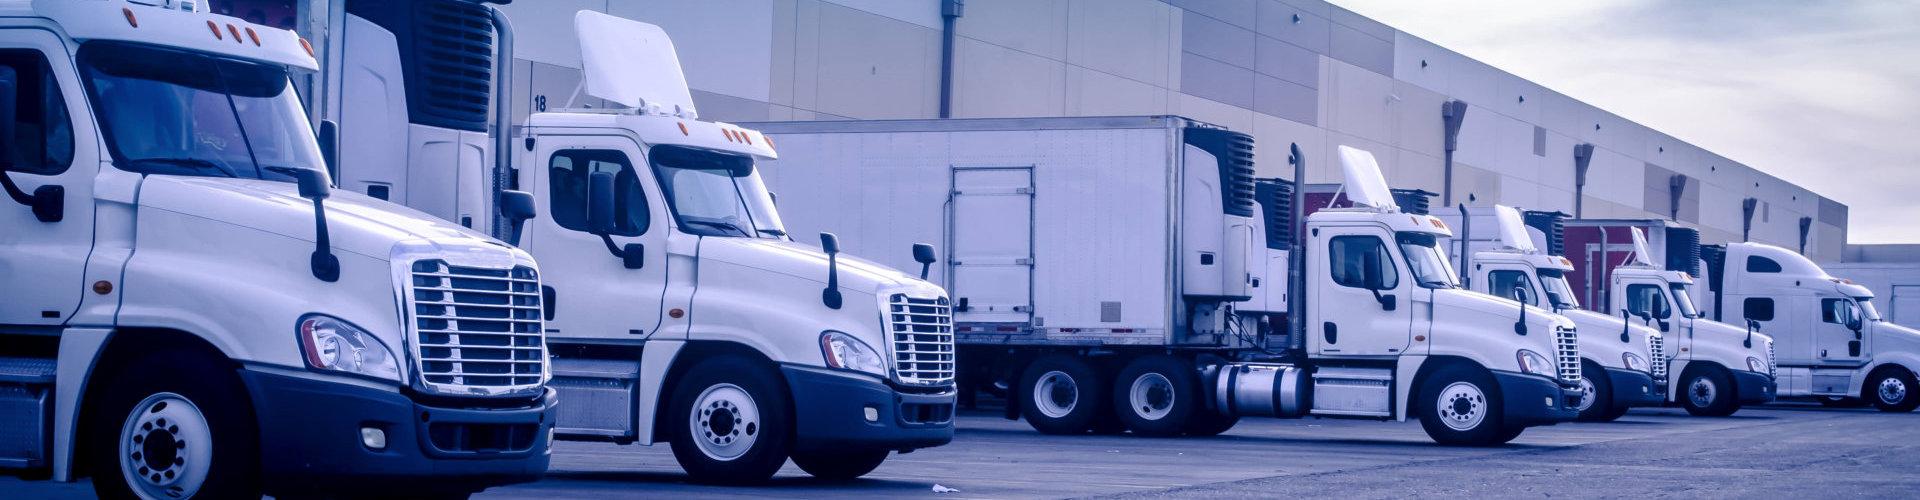 trucks on park